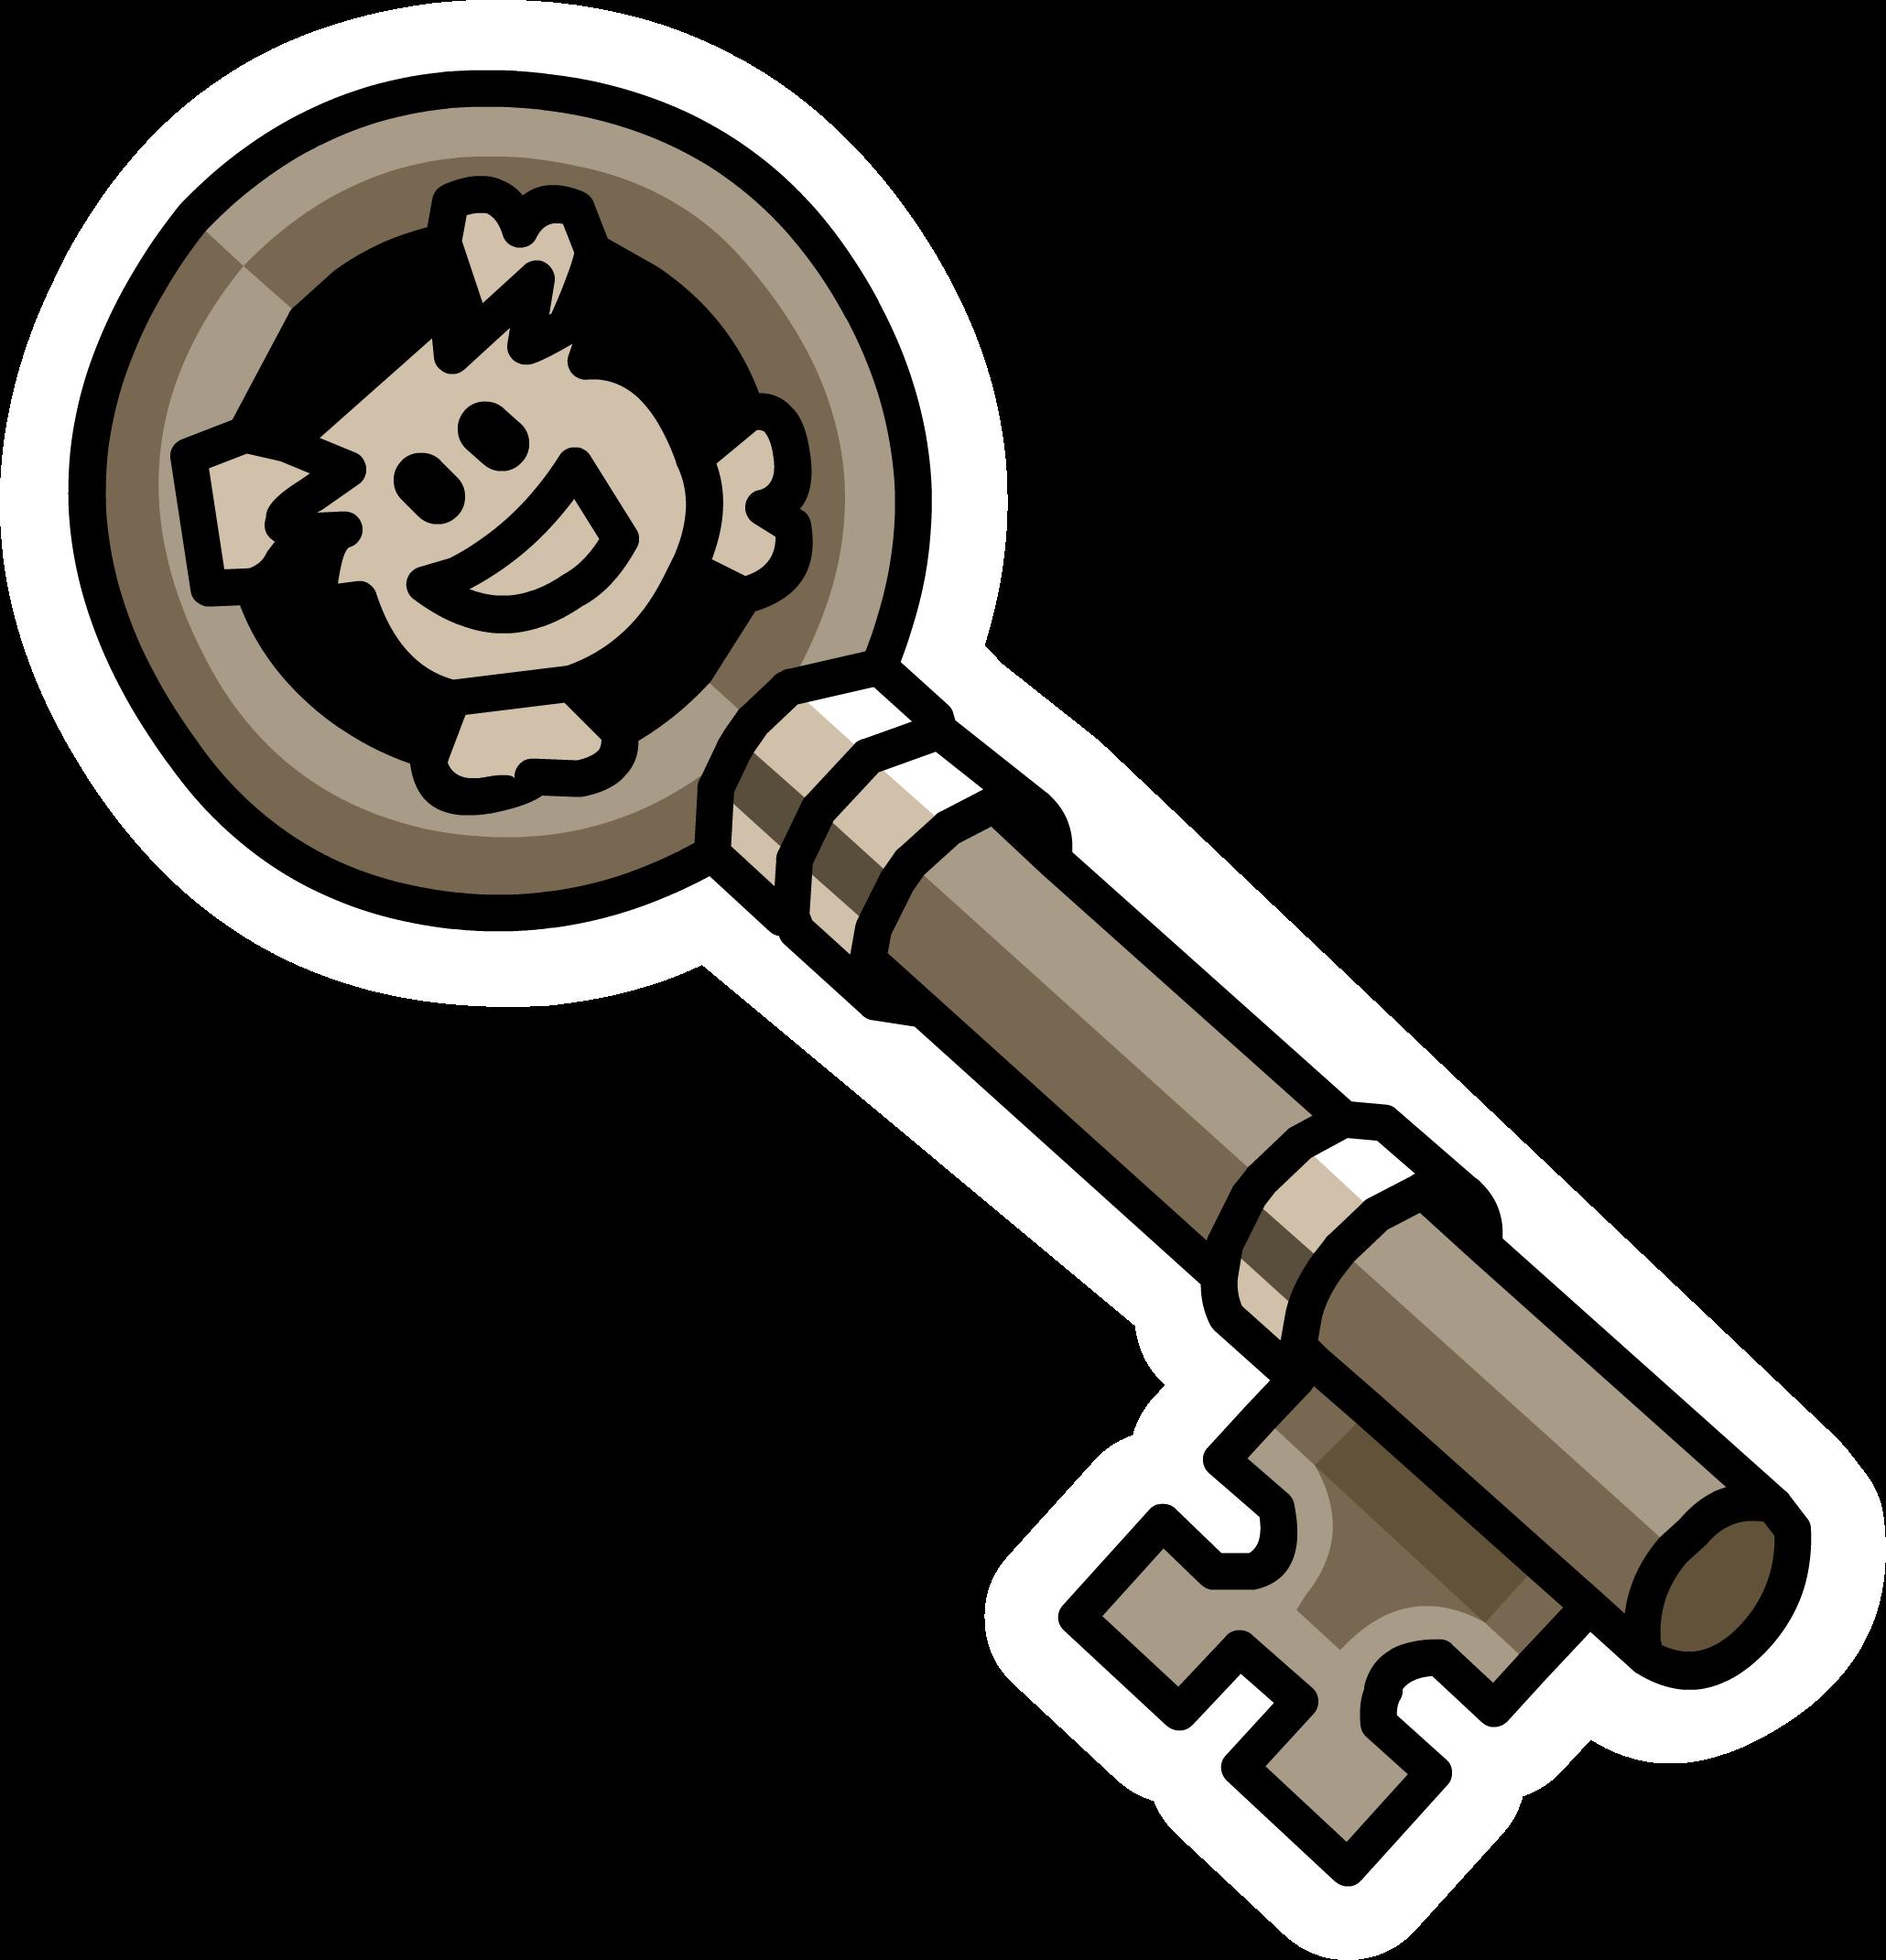 List of Pins